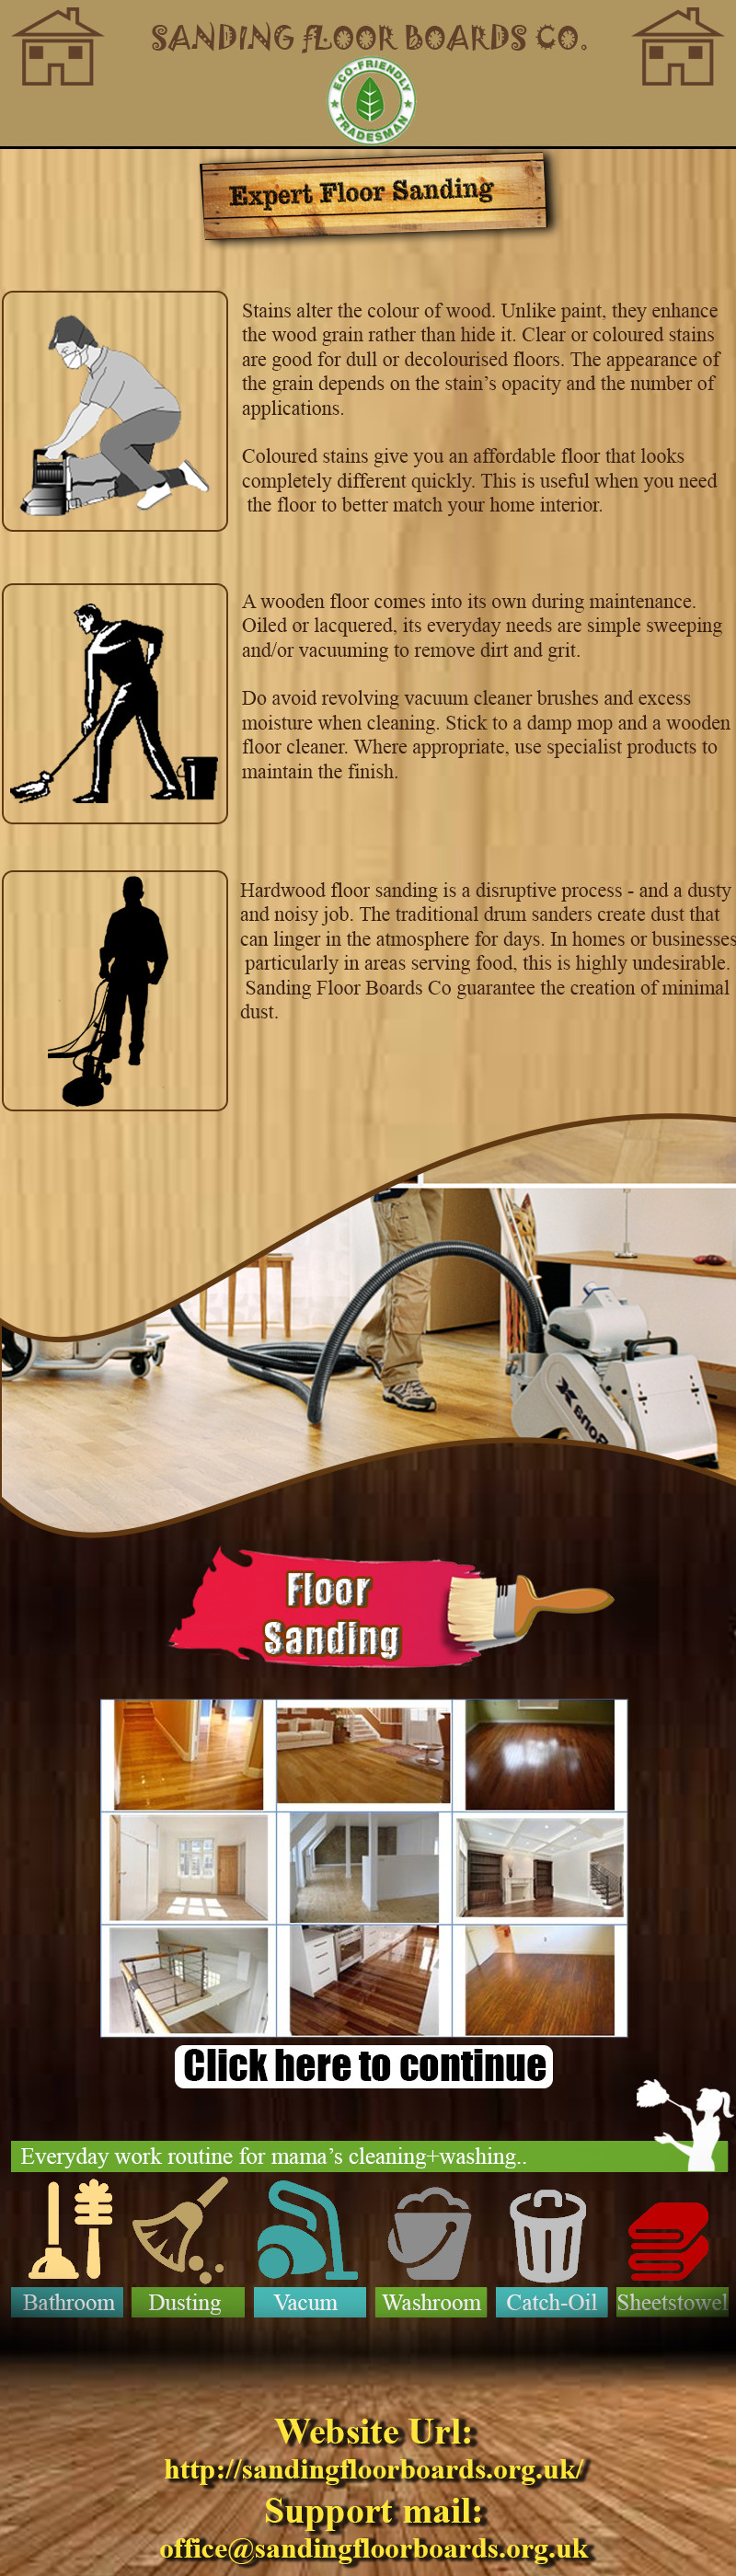 hardwood floor repair cincinnati of edwardmansom edwardmansom on pinterest inside 288a3f1cabbb5ad06312bdc255314c28